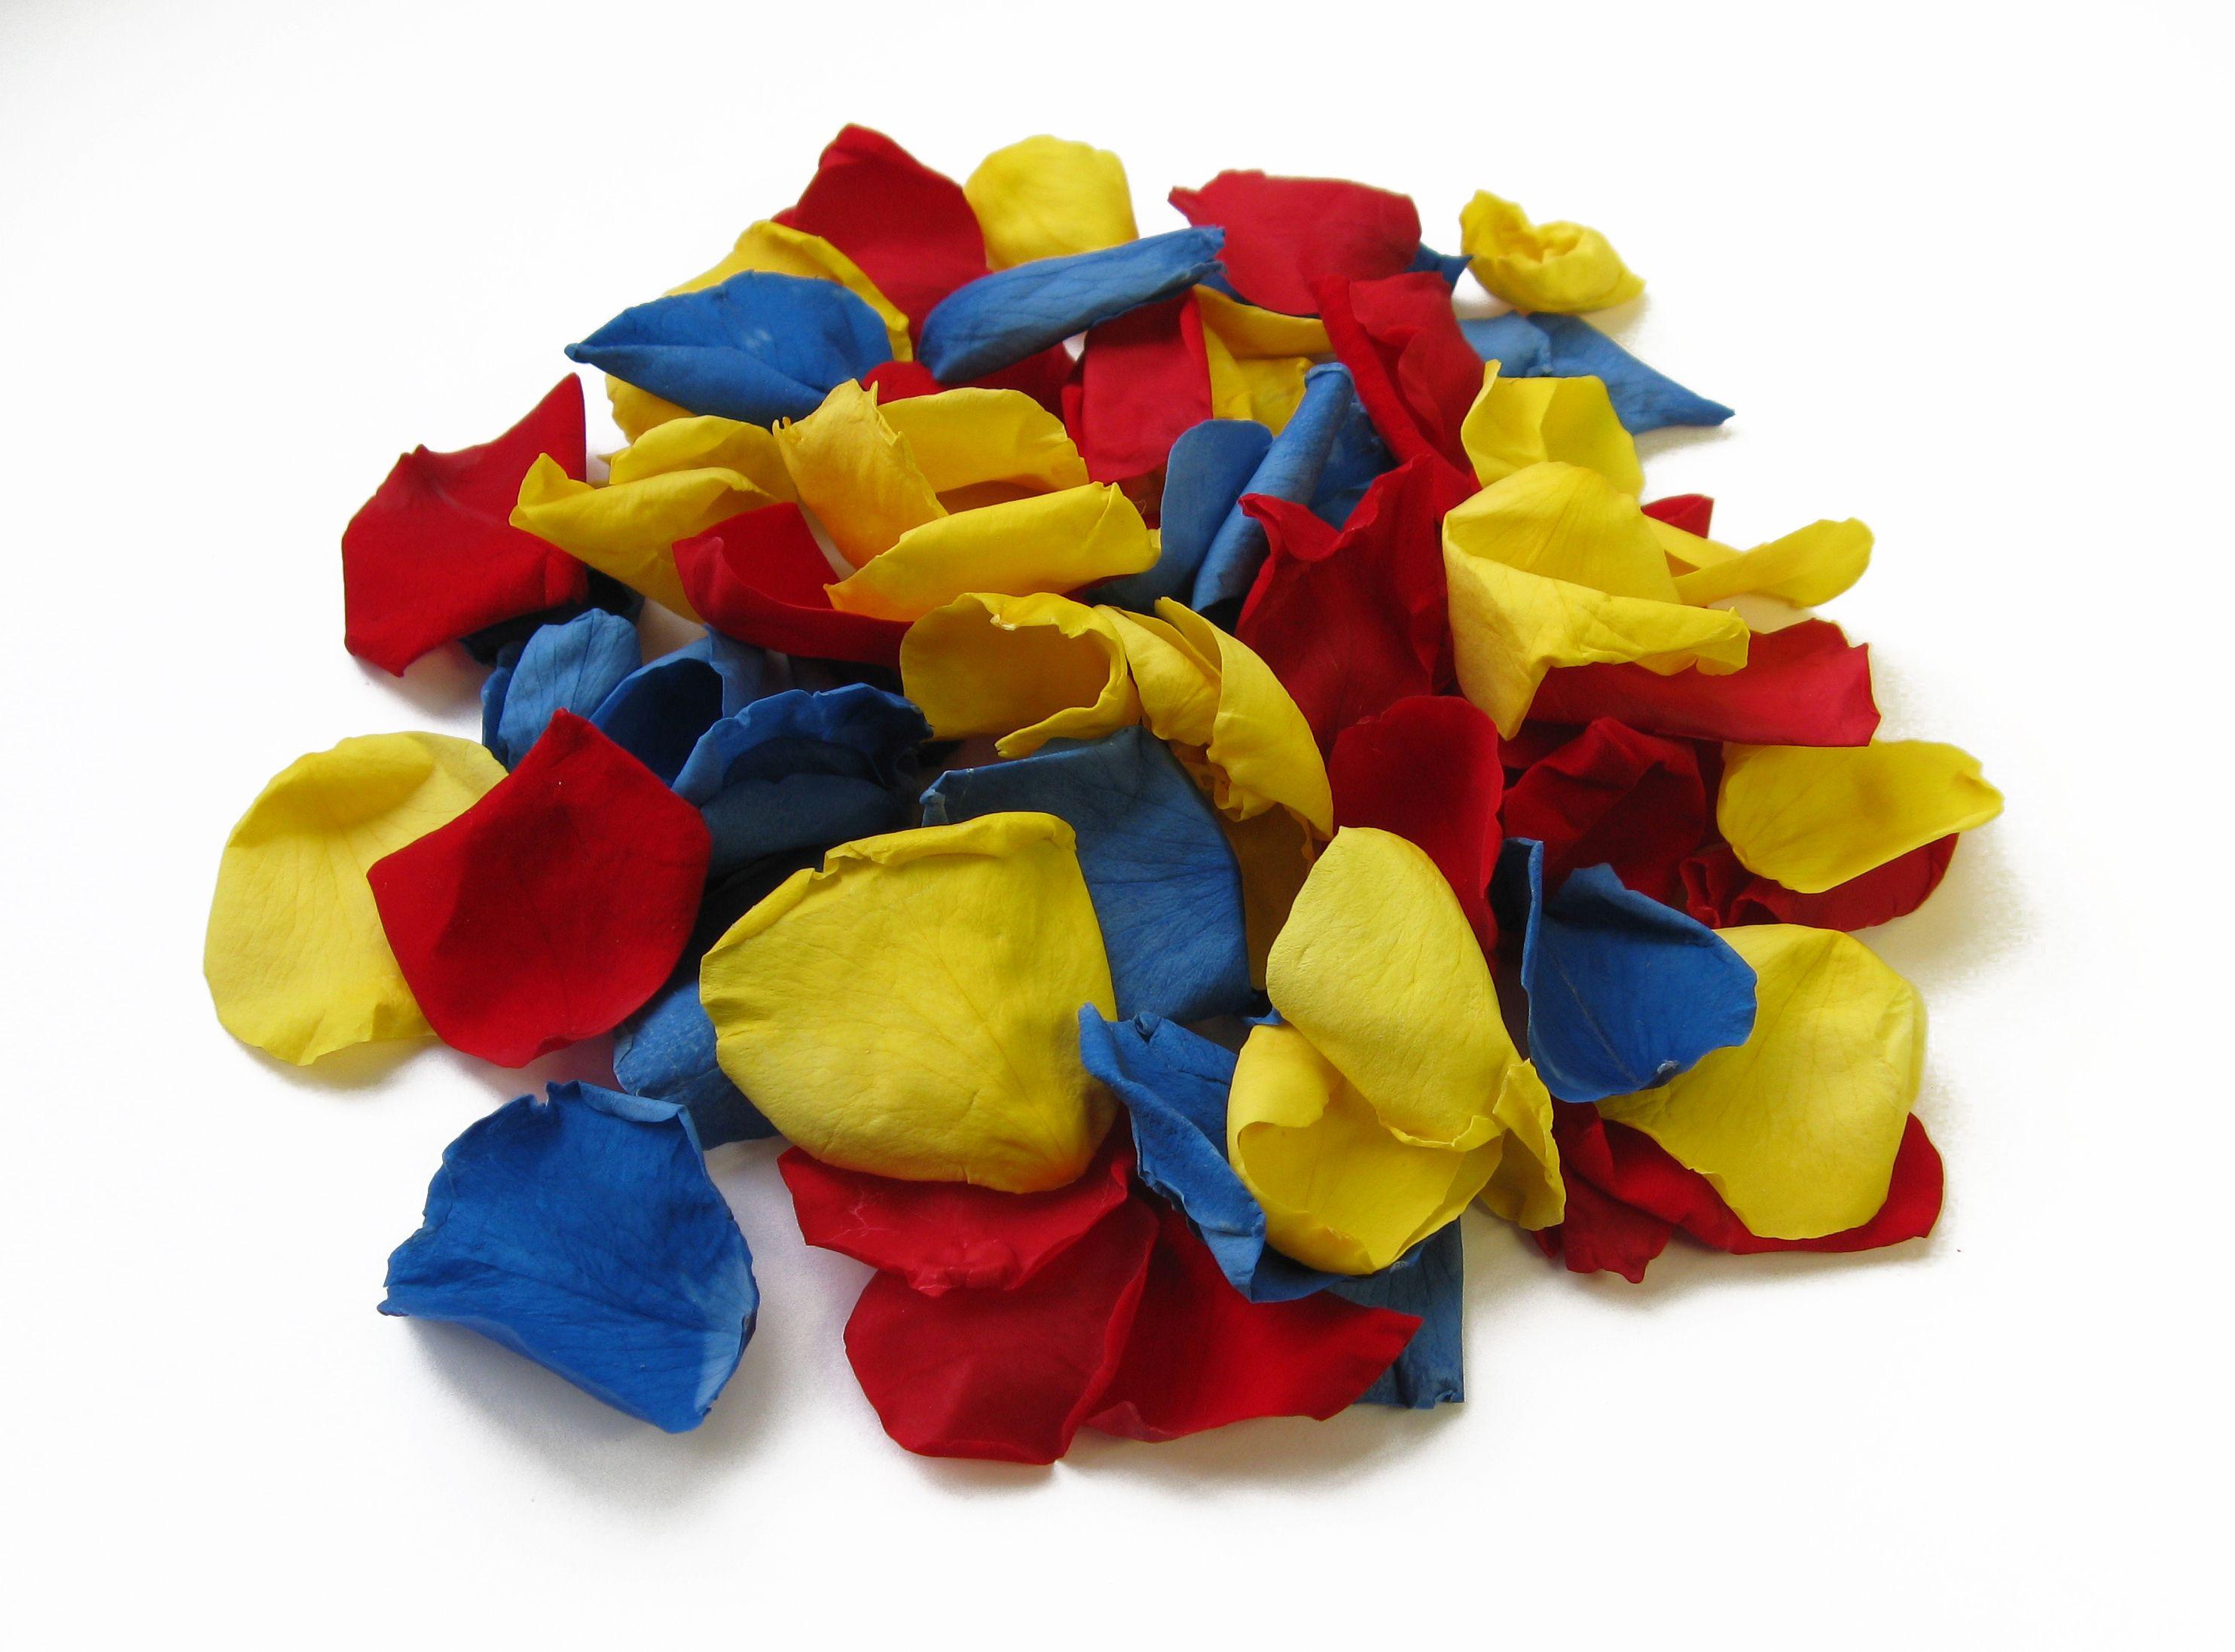 Primary coloured confetti - great for kids!